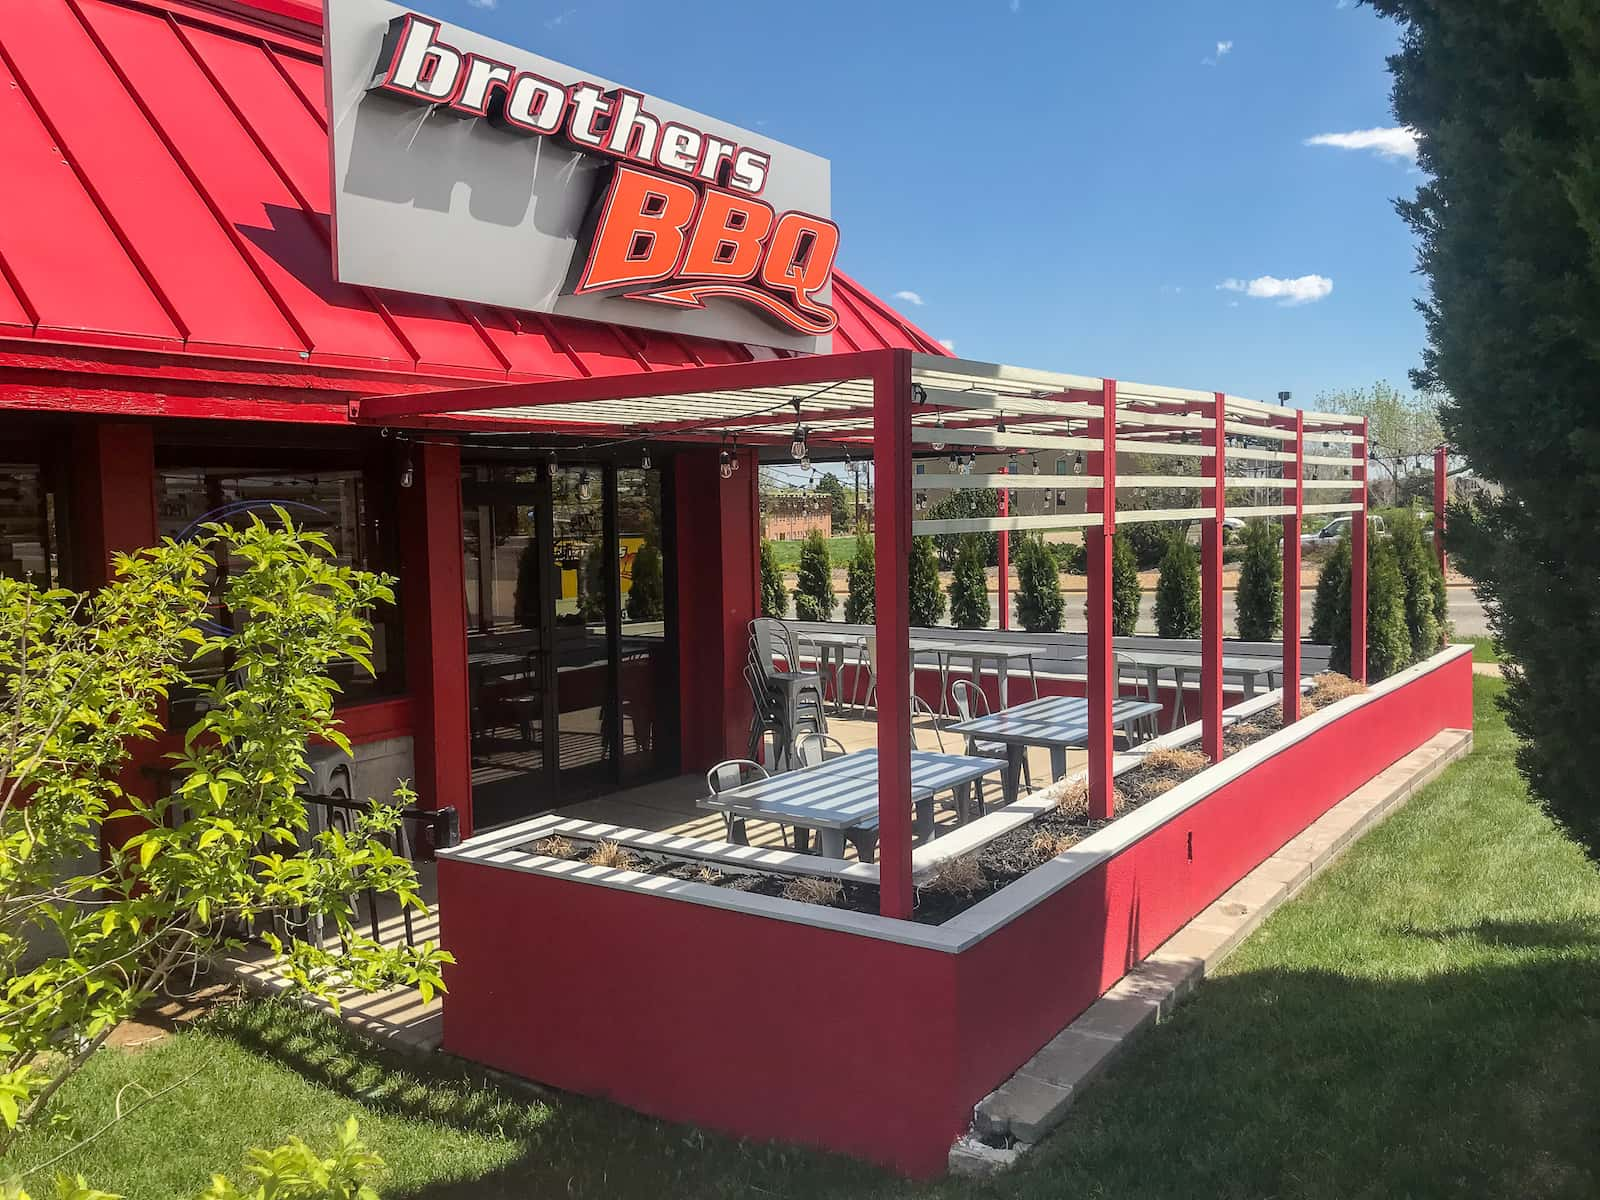 Restaurant Metal Pergola Patio Outdoor Dining Broomfield CO